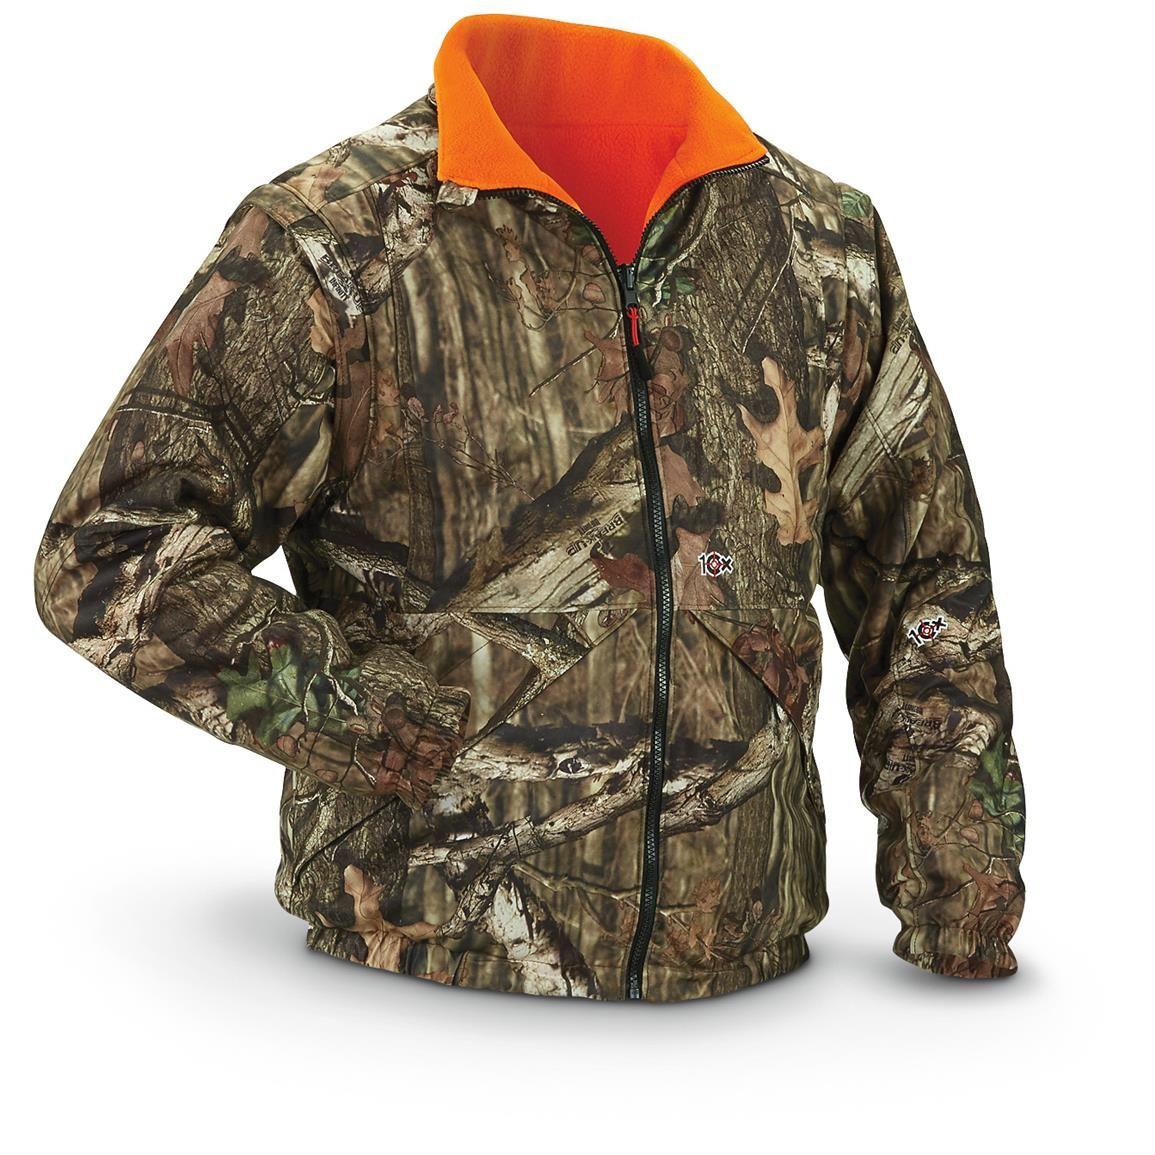 fa611ef6d972a Walls 10X Men s Reversible Inner Systems Camo Jacket